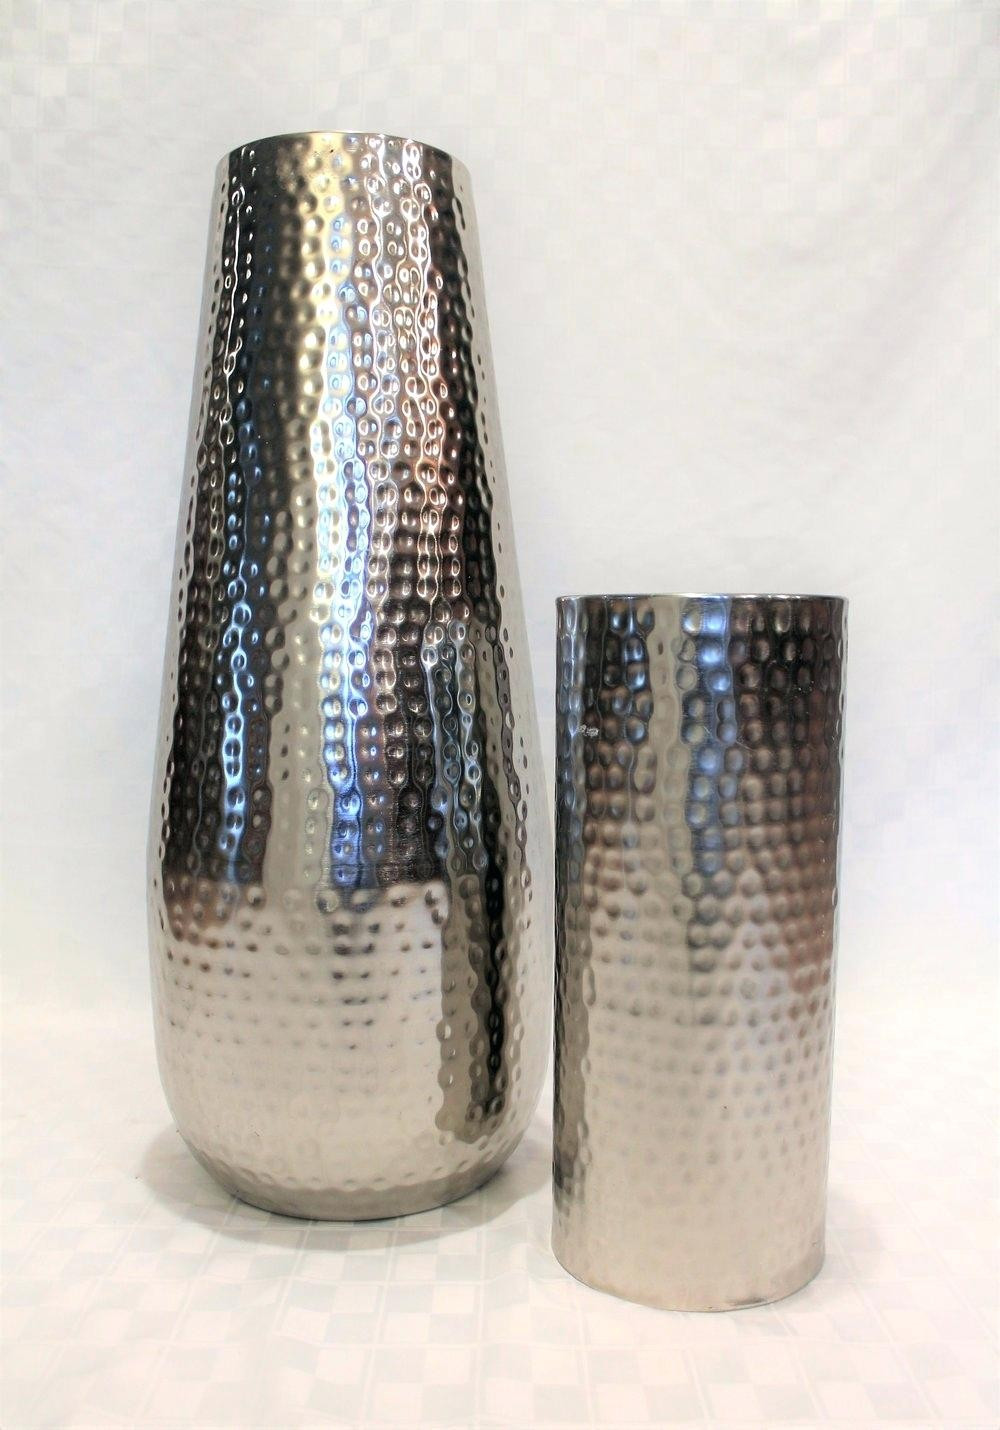 36 glass cylinder vases of silver vases wholesale pandoraocharms us within silver vases wholesale glass bulk tall flower fl org